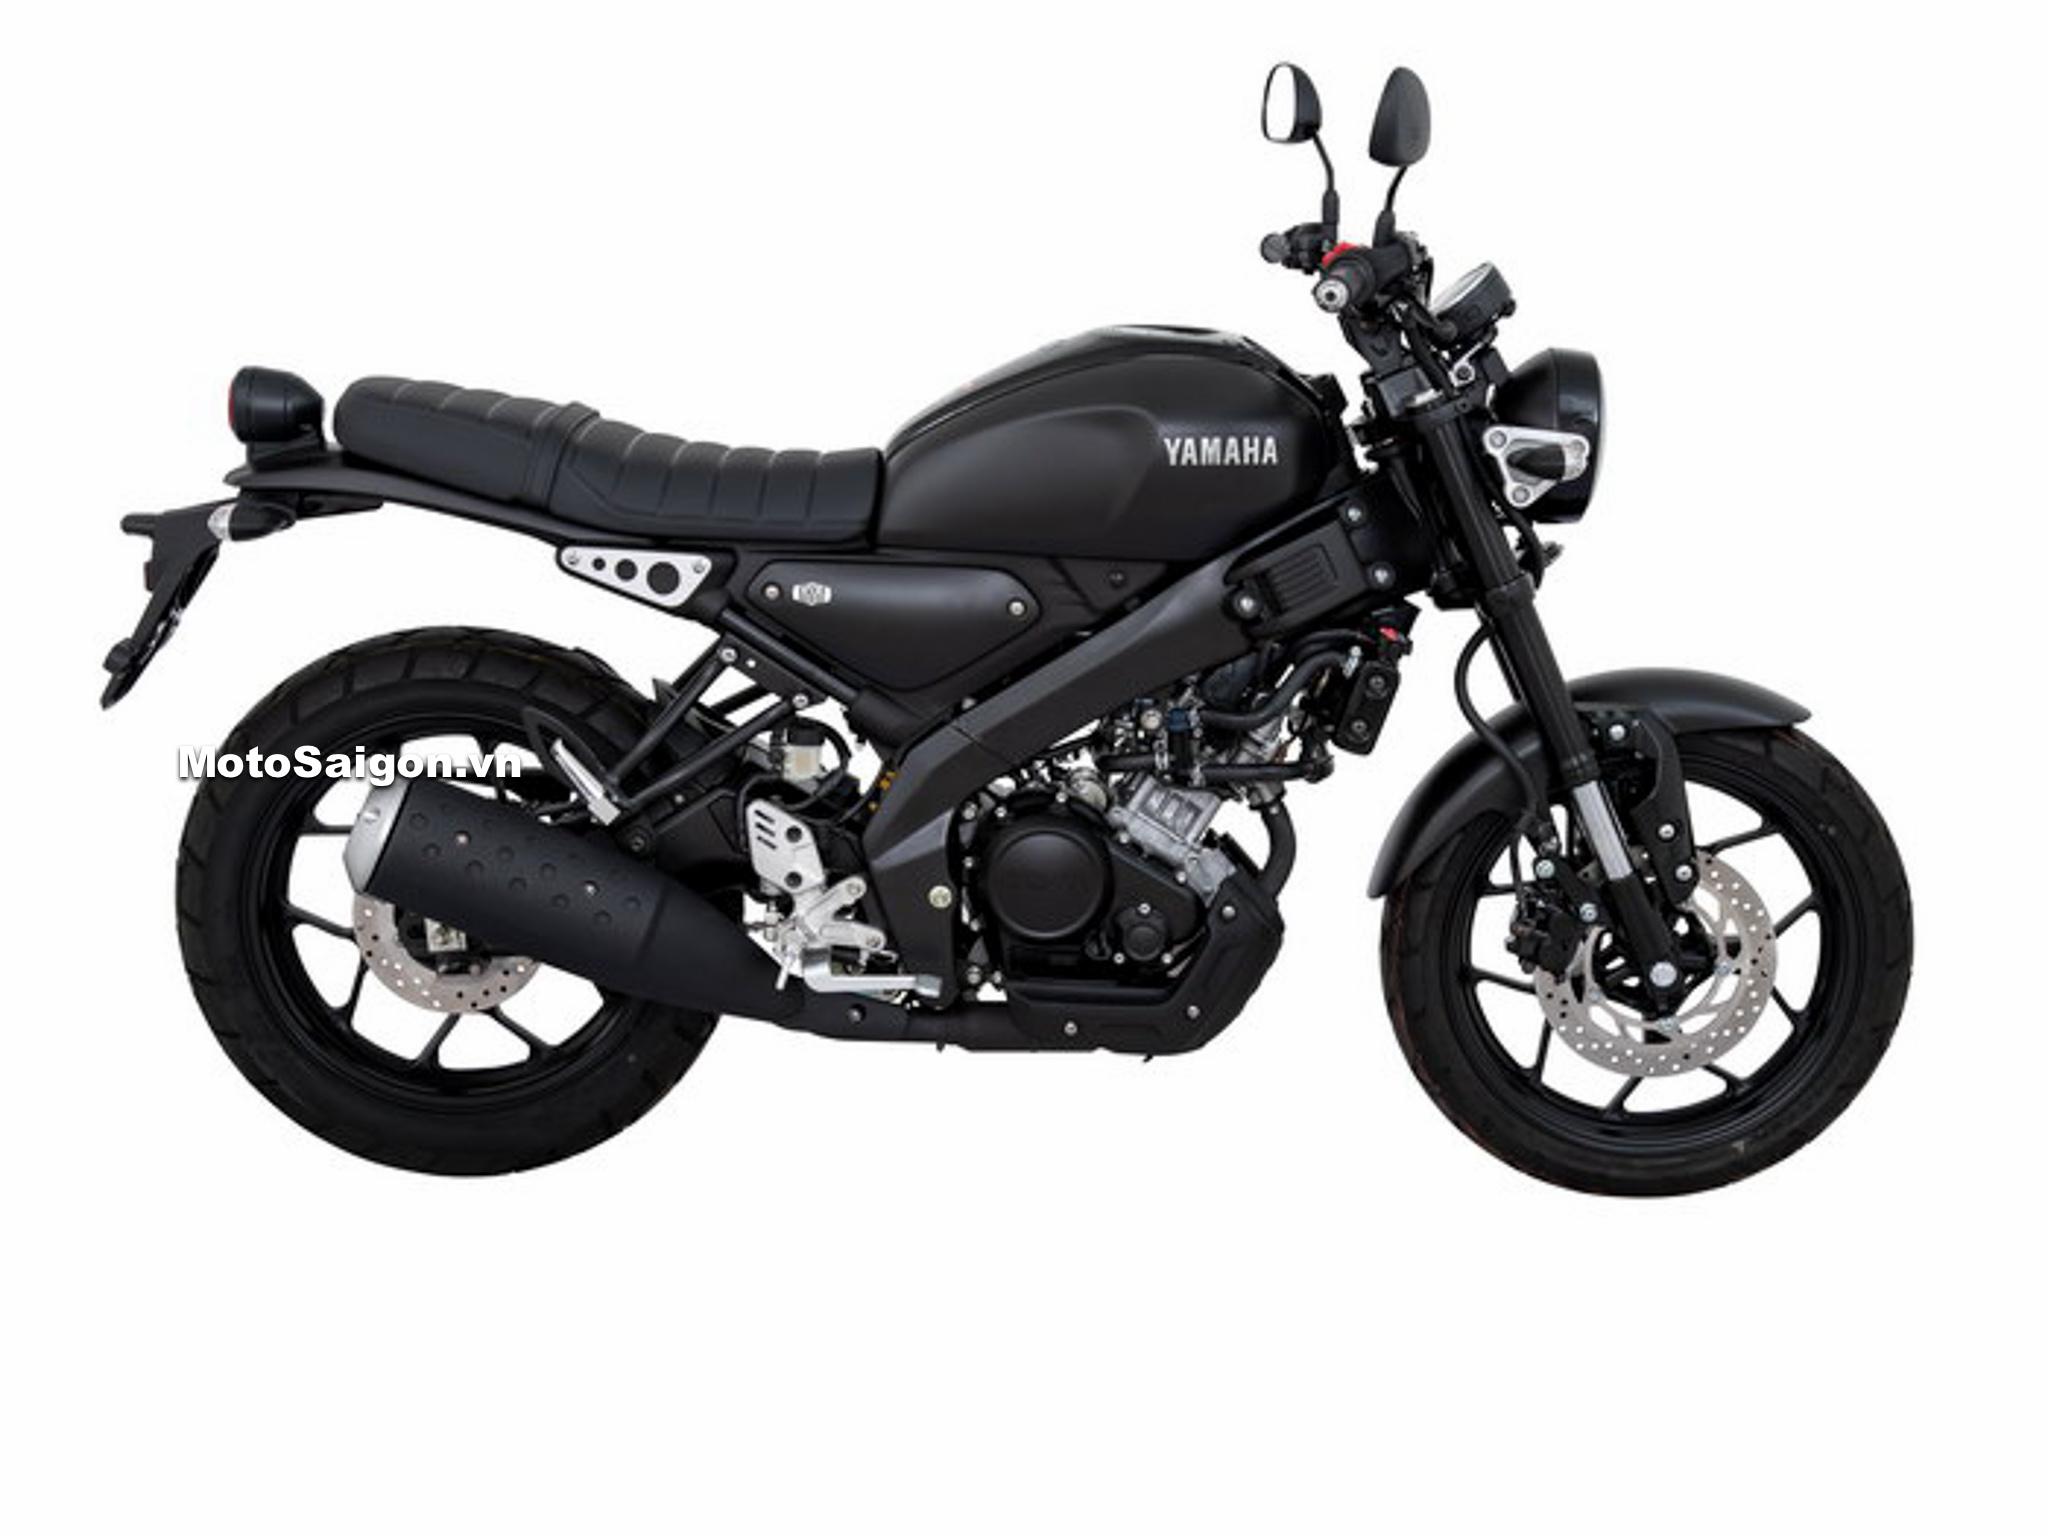 Yamaha XSR155 Wanderlust màu đen Black